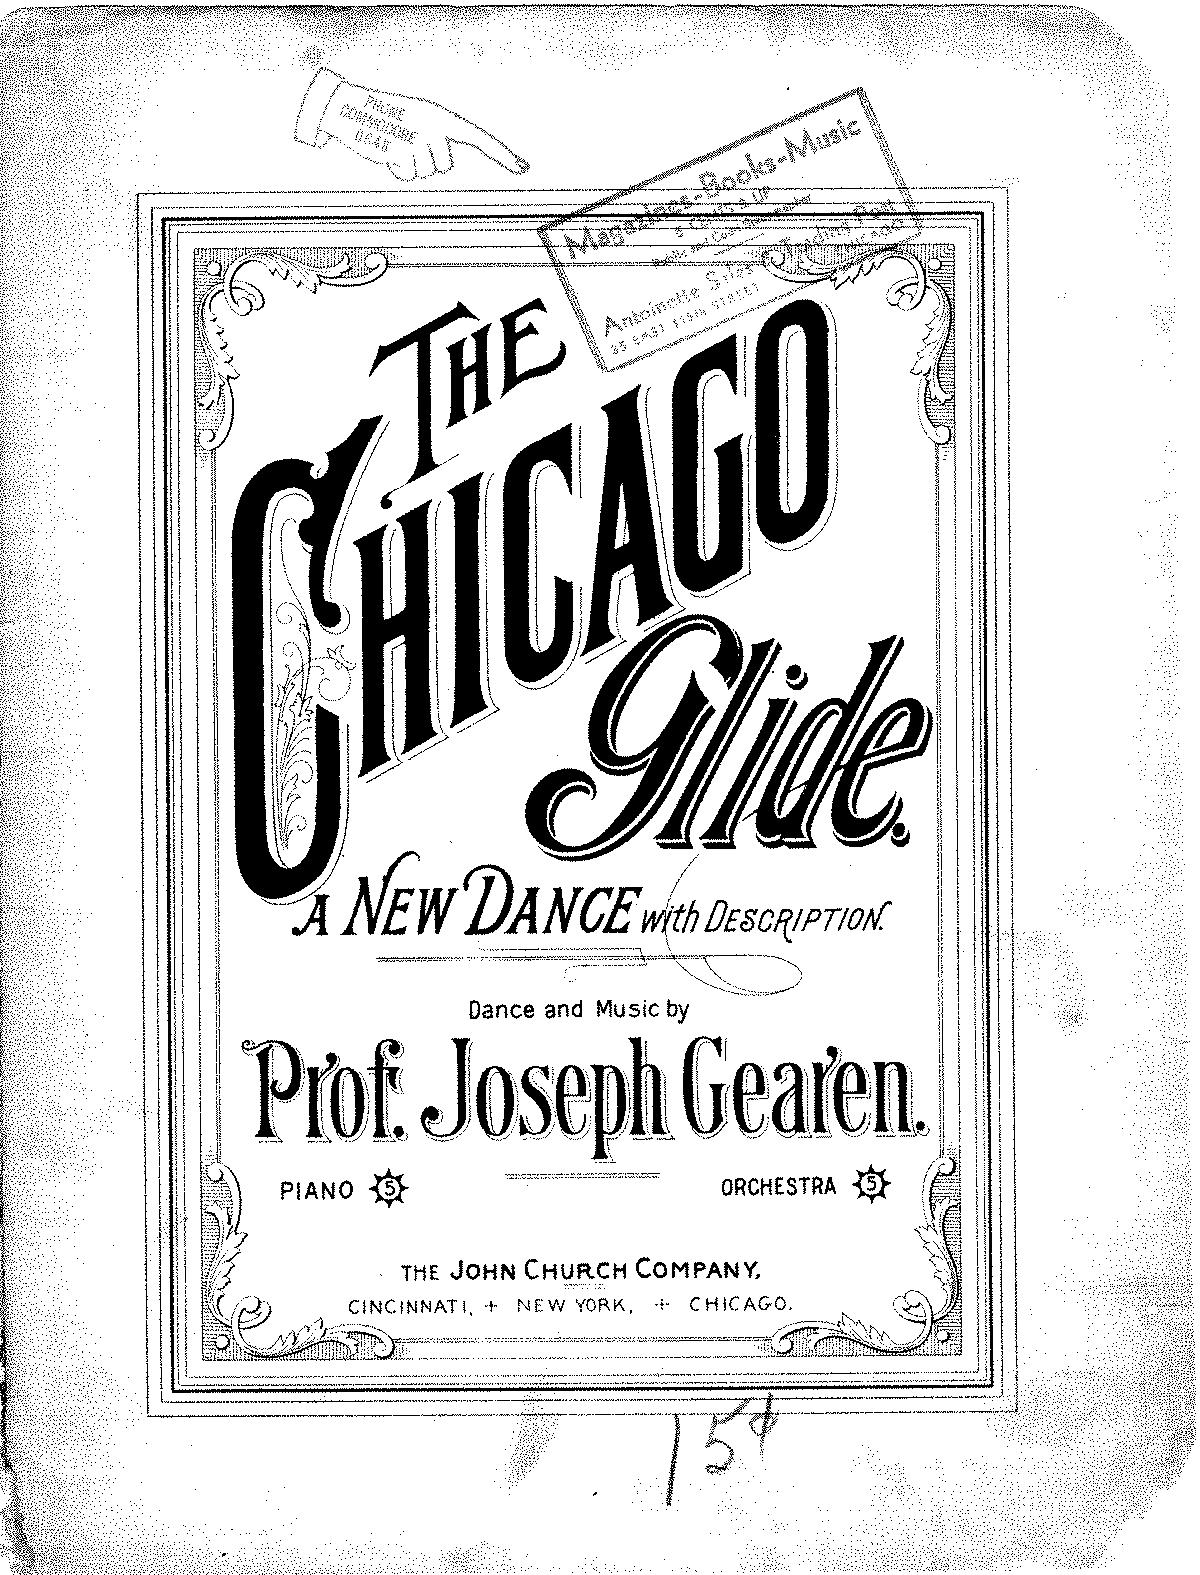 chicago general information